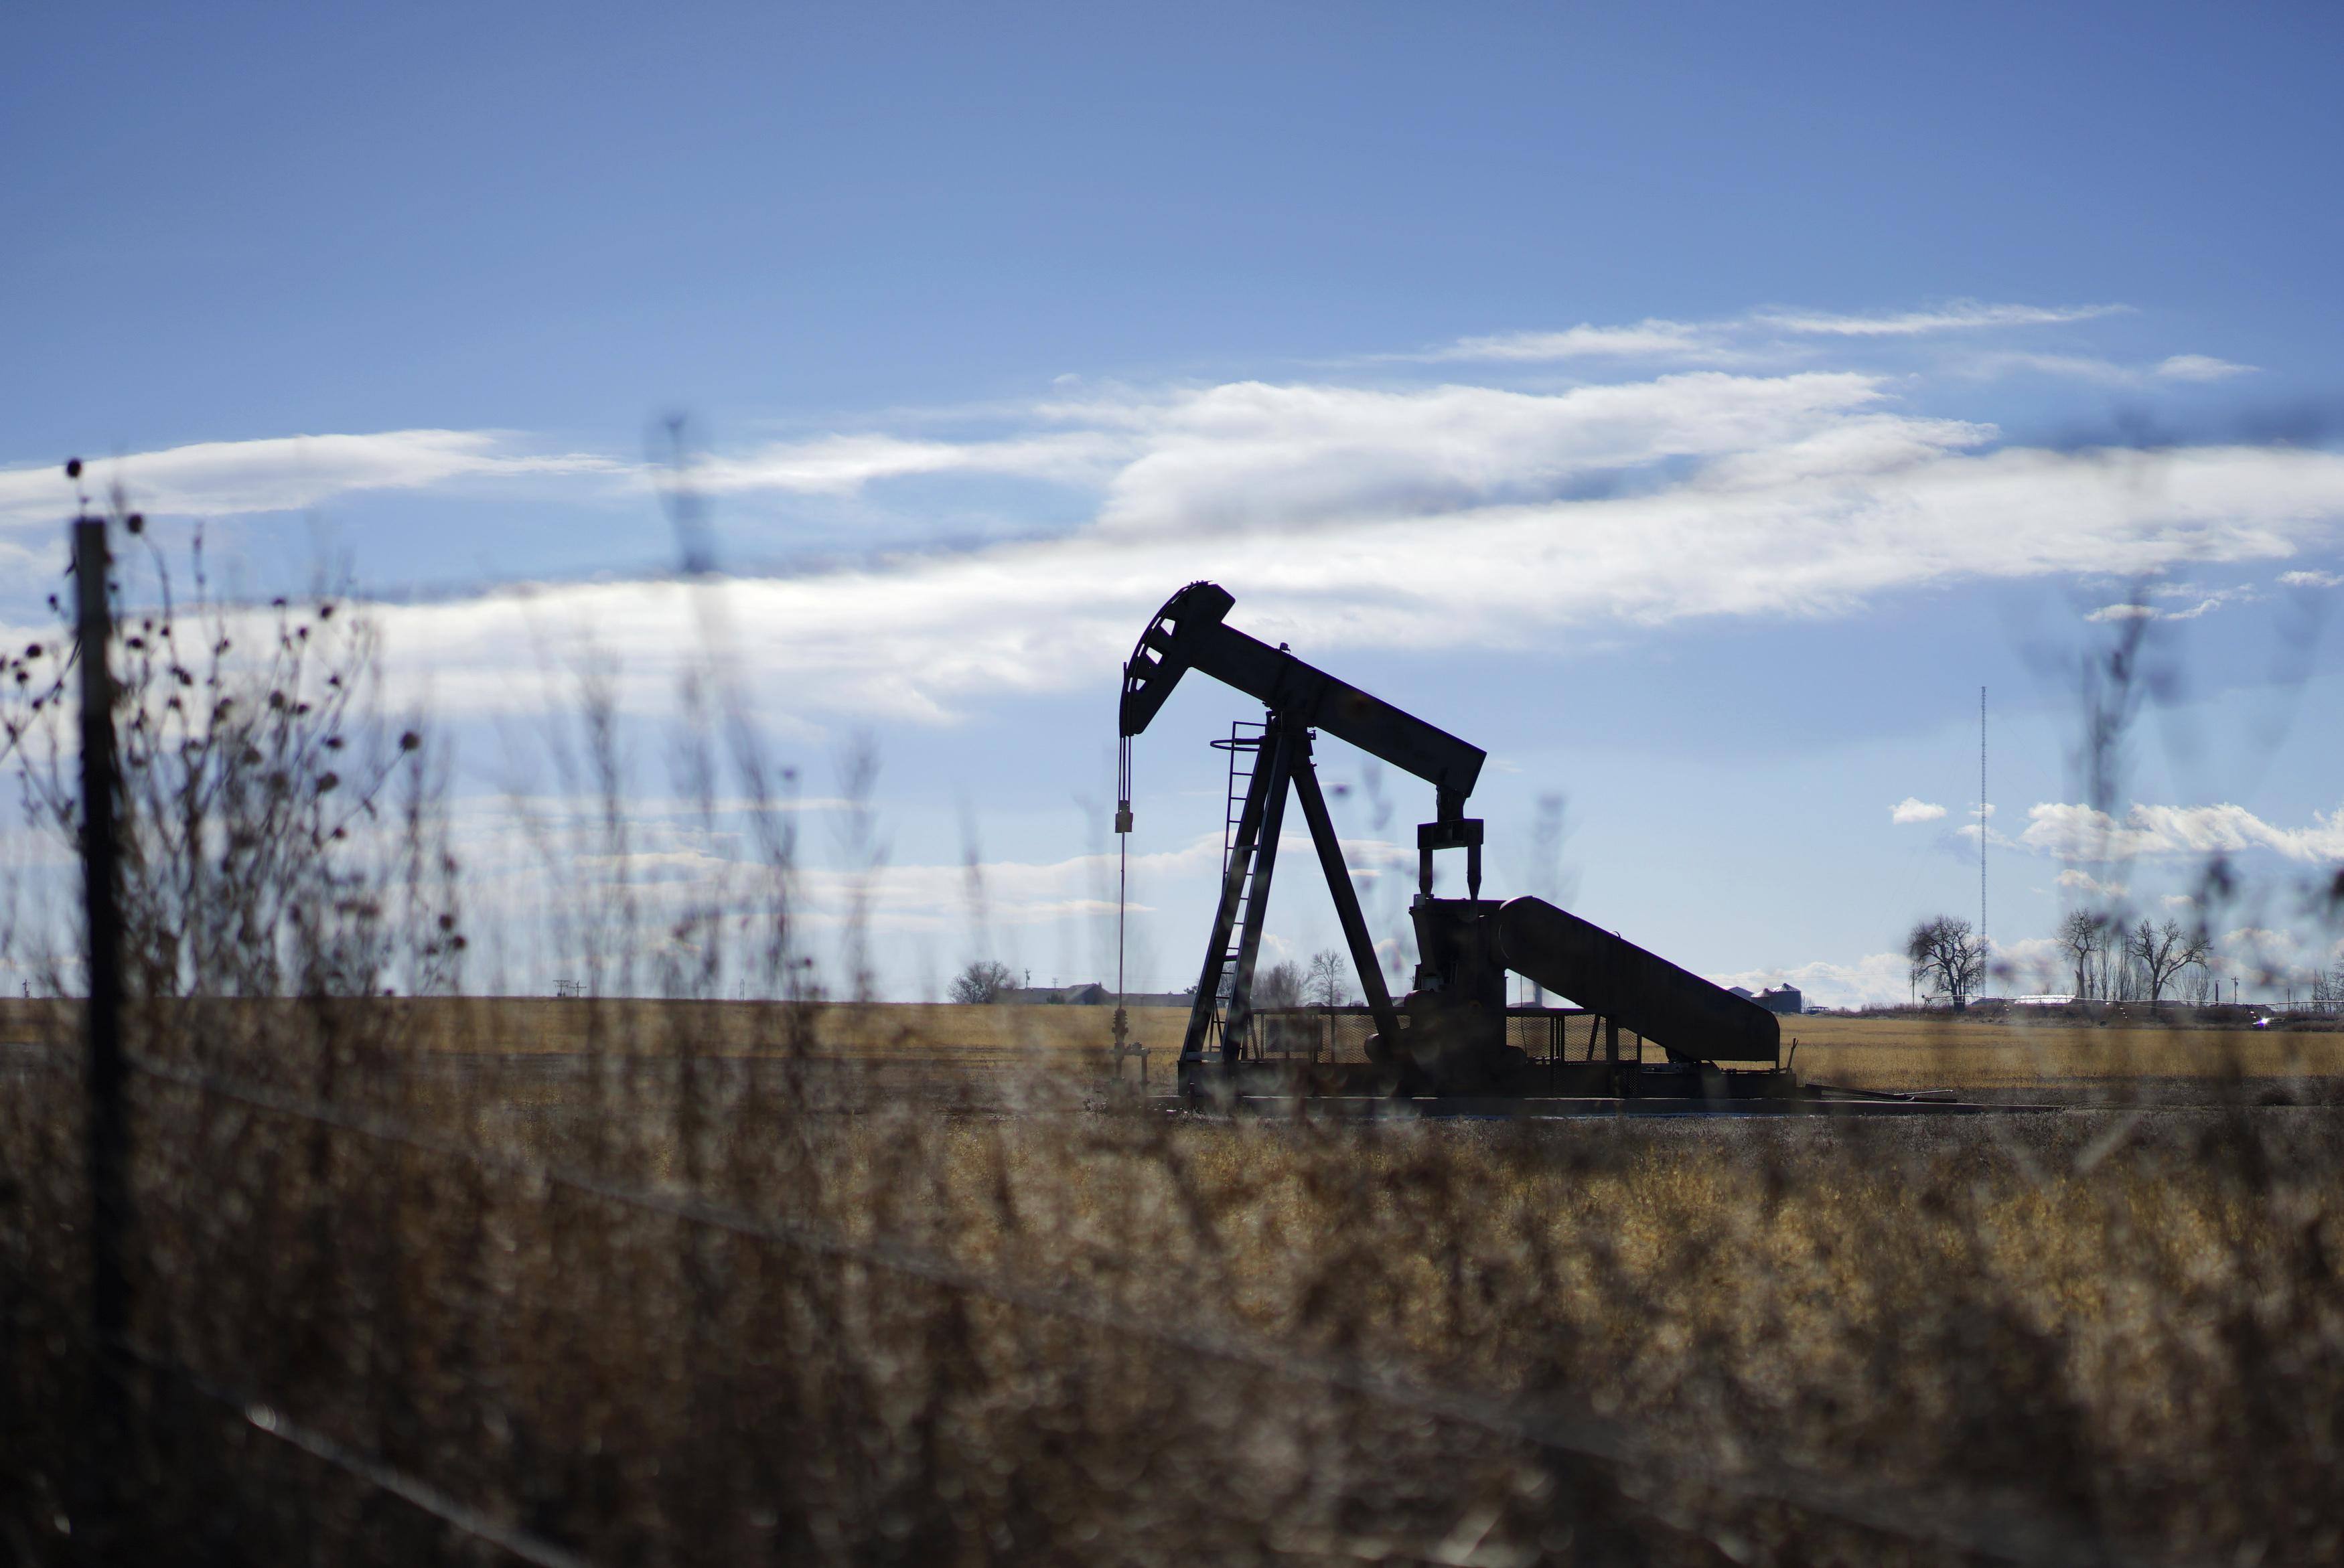 An oil well is seen near Denver, Colorado February 2, 2015. REUTERS/Rick Wilking